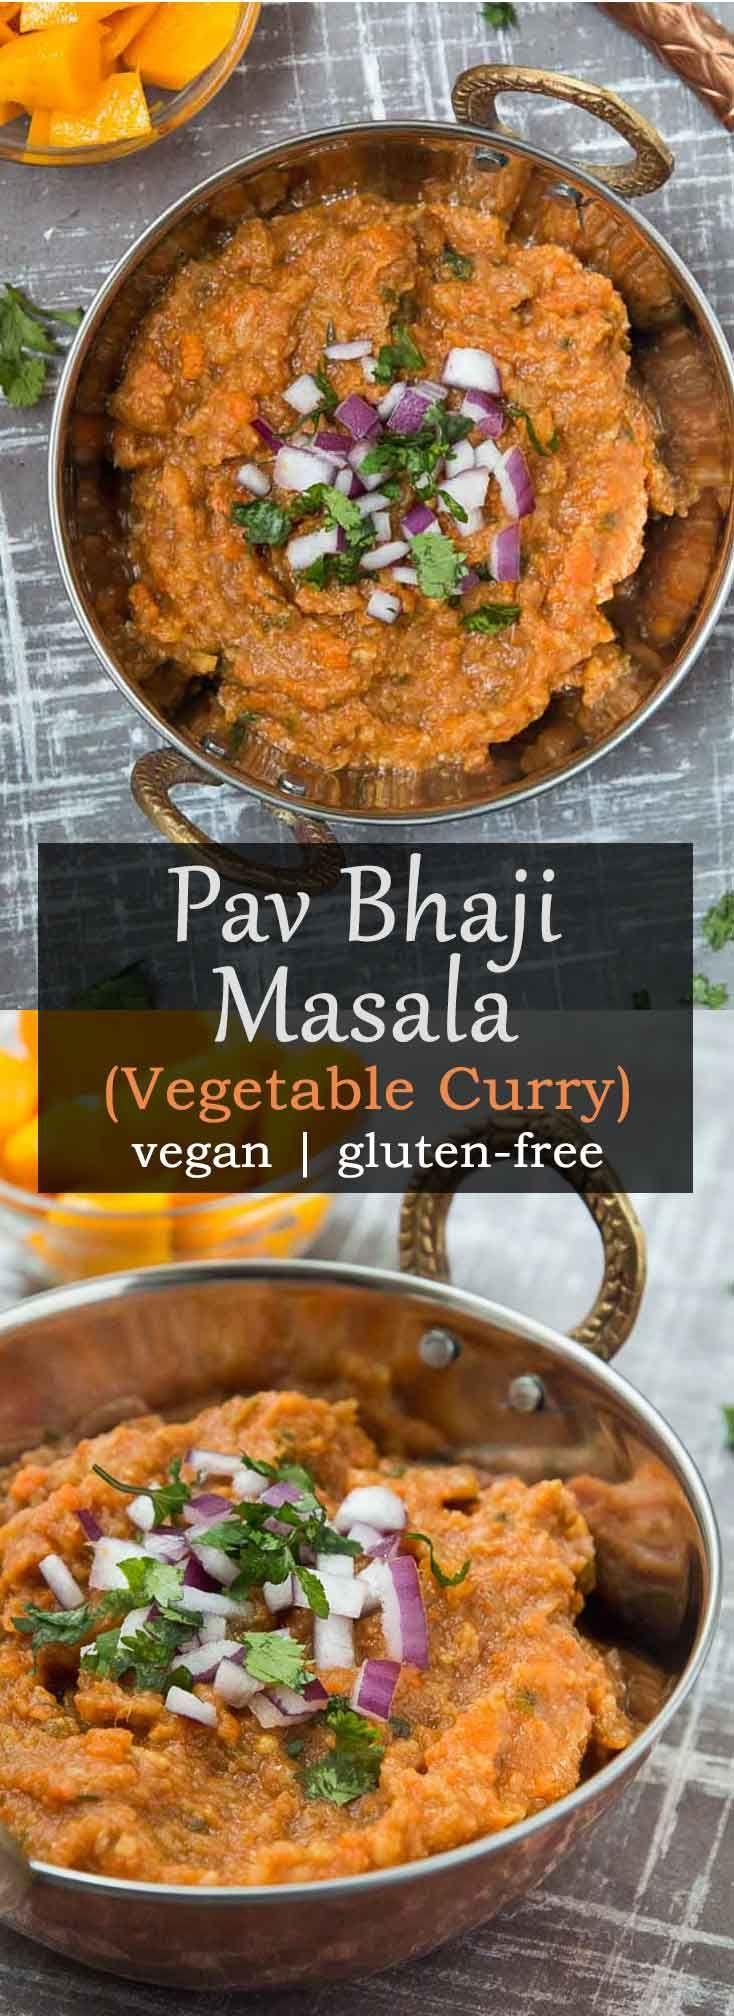 Pav bhaji Masala Recipe (Vegetable Curry) #vegan #glutenfree #healthy   Vegetarian Gastronomy   www.VegetarianGastronomy.com